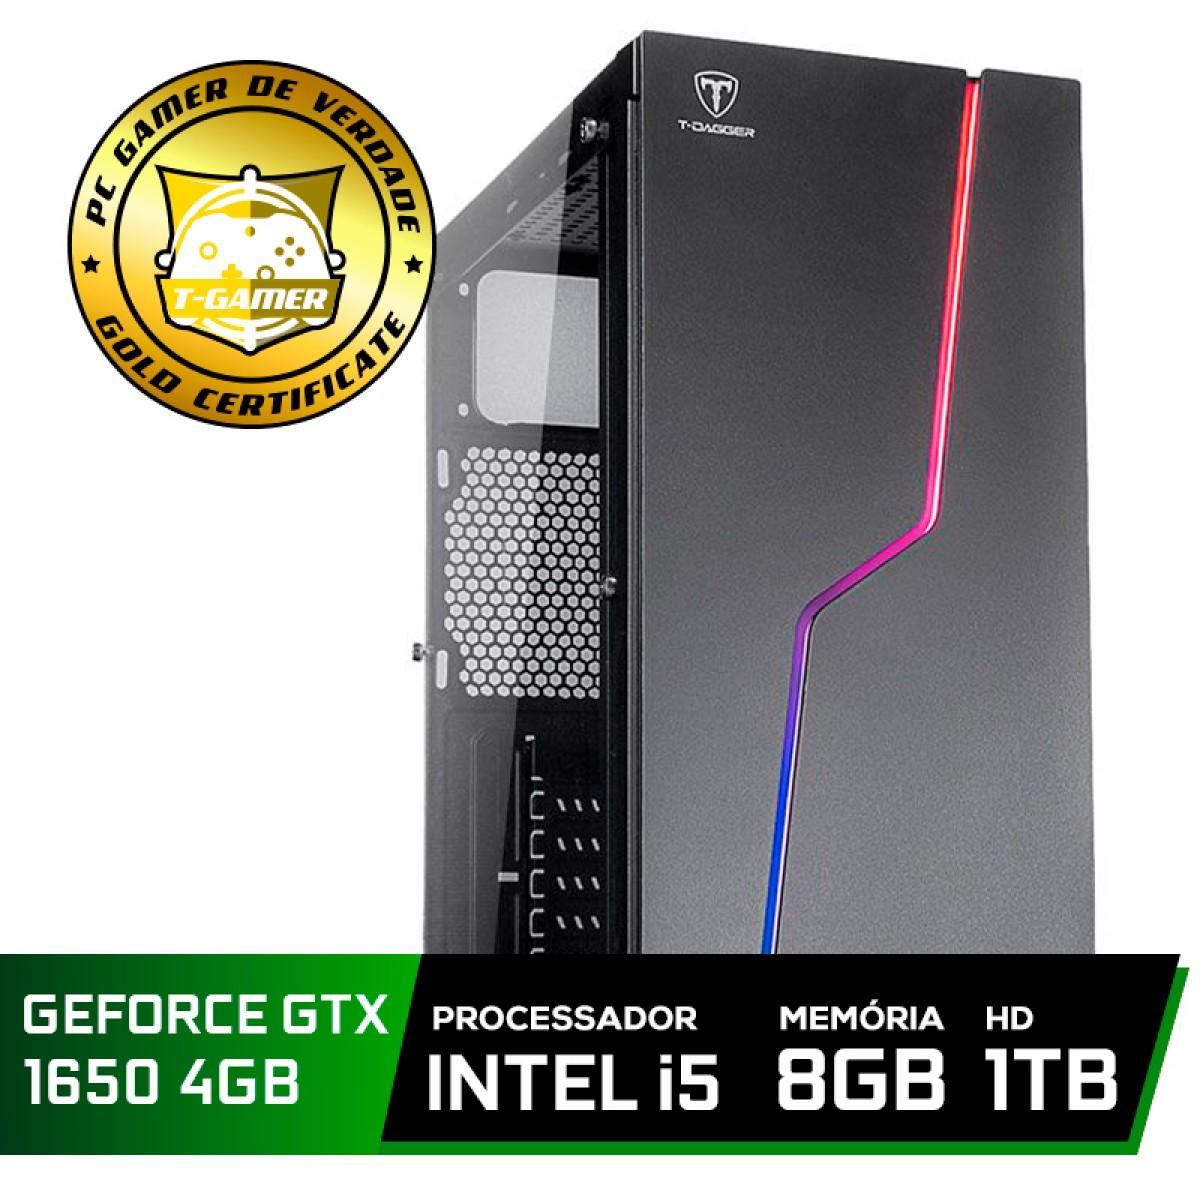 Pc Gamer Tera Edition Intel Core i5 9600K / GeForce GTX 1650 4GB / DDR4 8GB / HD 1TB / 550W